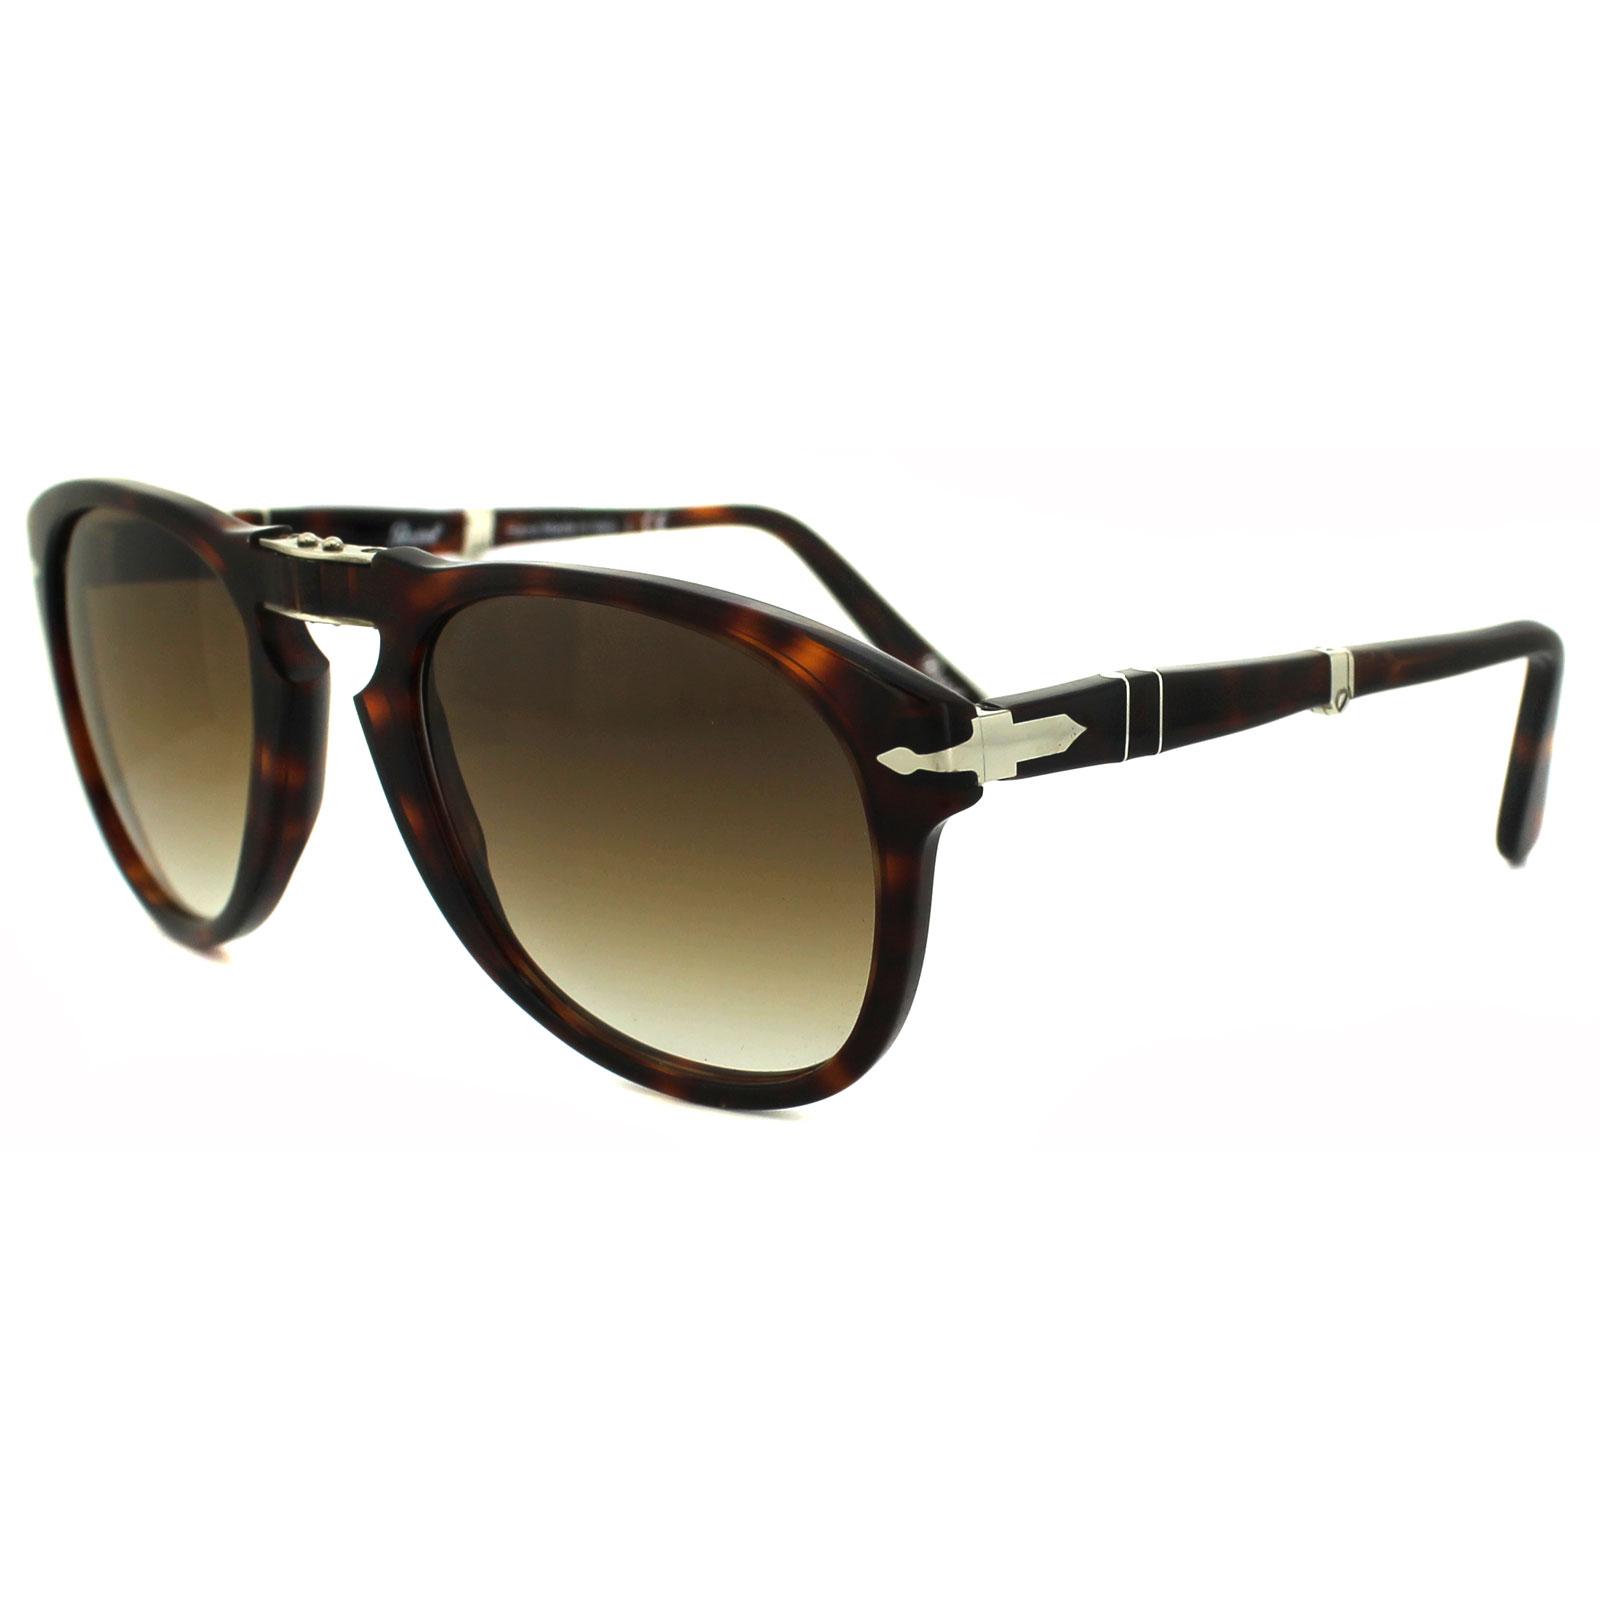 Persol Folding Sunglasses  persol sunglasses 0714 24 51 havana brown grant folding steve